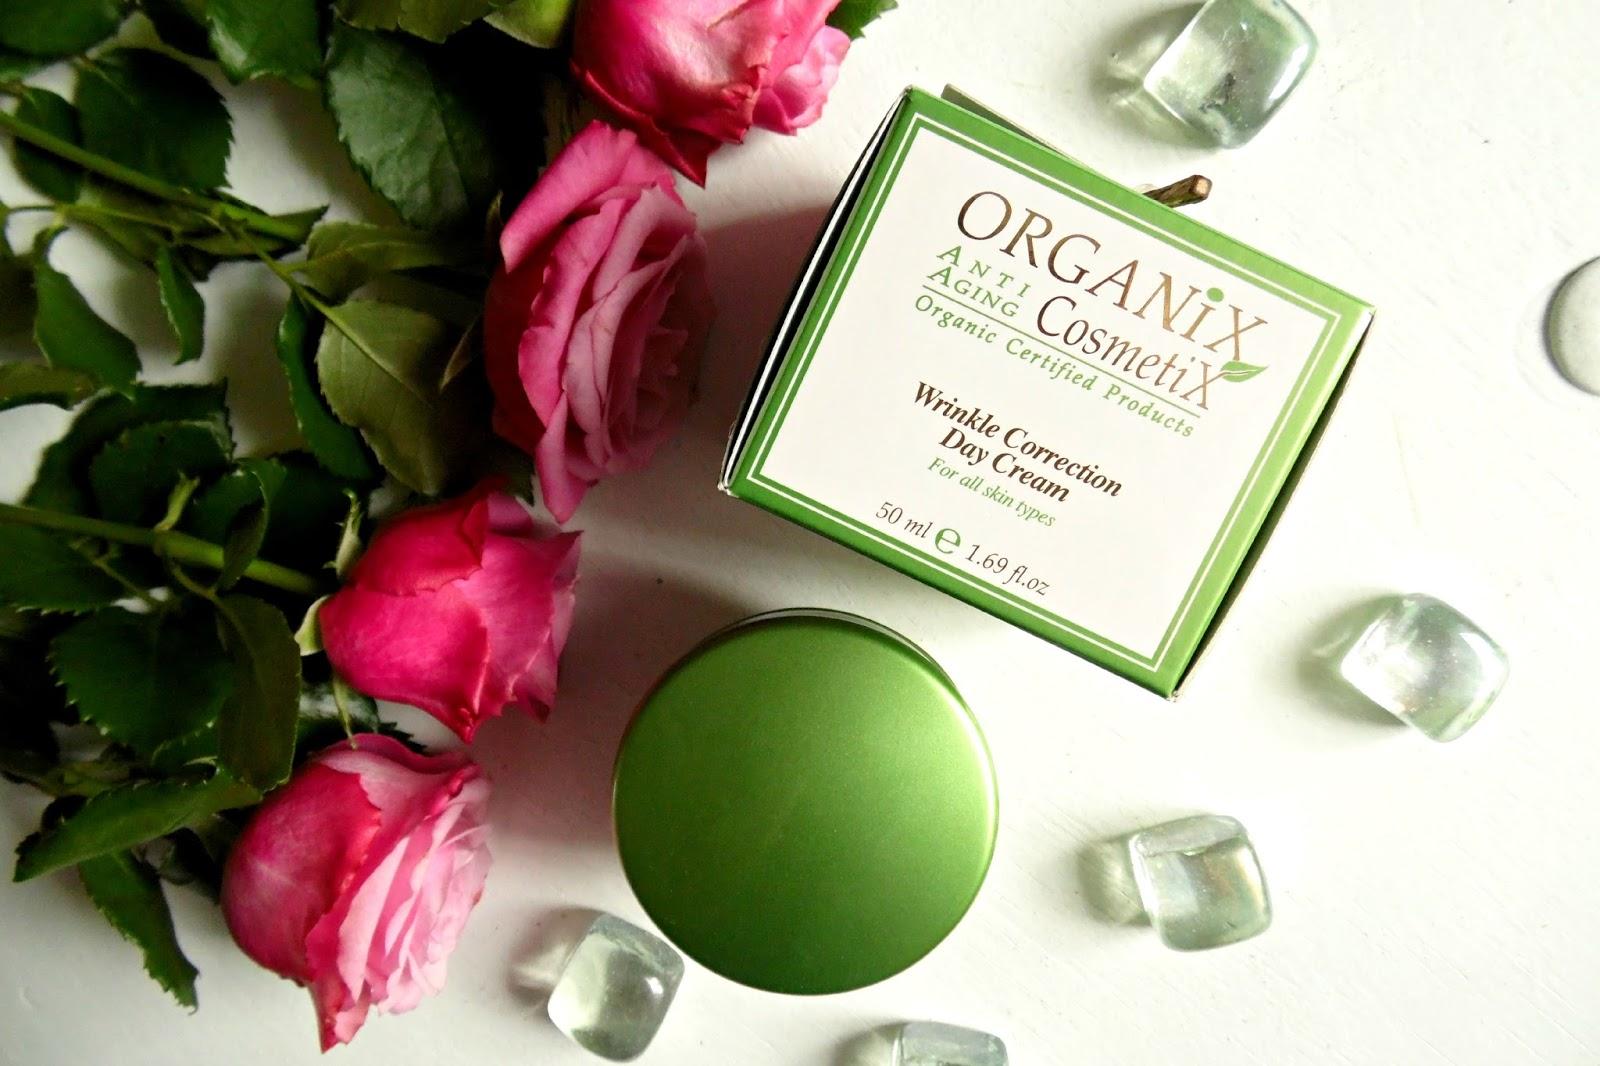 Avida Dollars Blog: Organiczny, lekki krem na dzieńi dealny podpod makijaż | Organix Cosmetix, Organiczny przeciwzmarszczkowy krem  na dzień